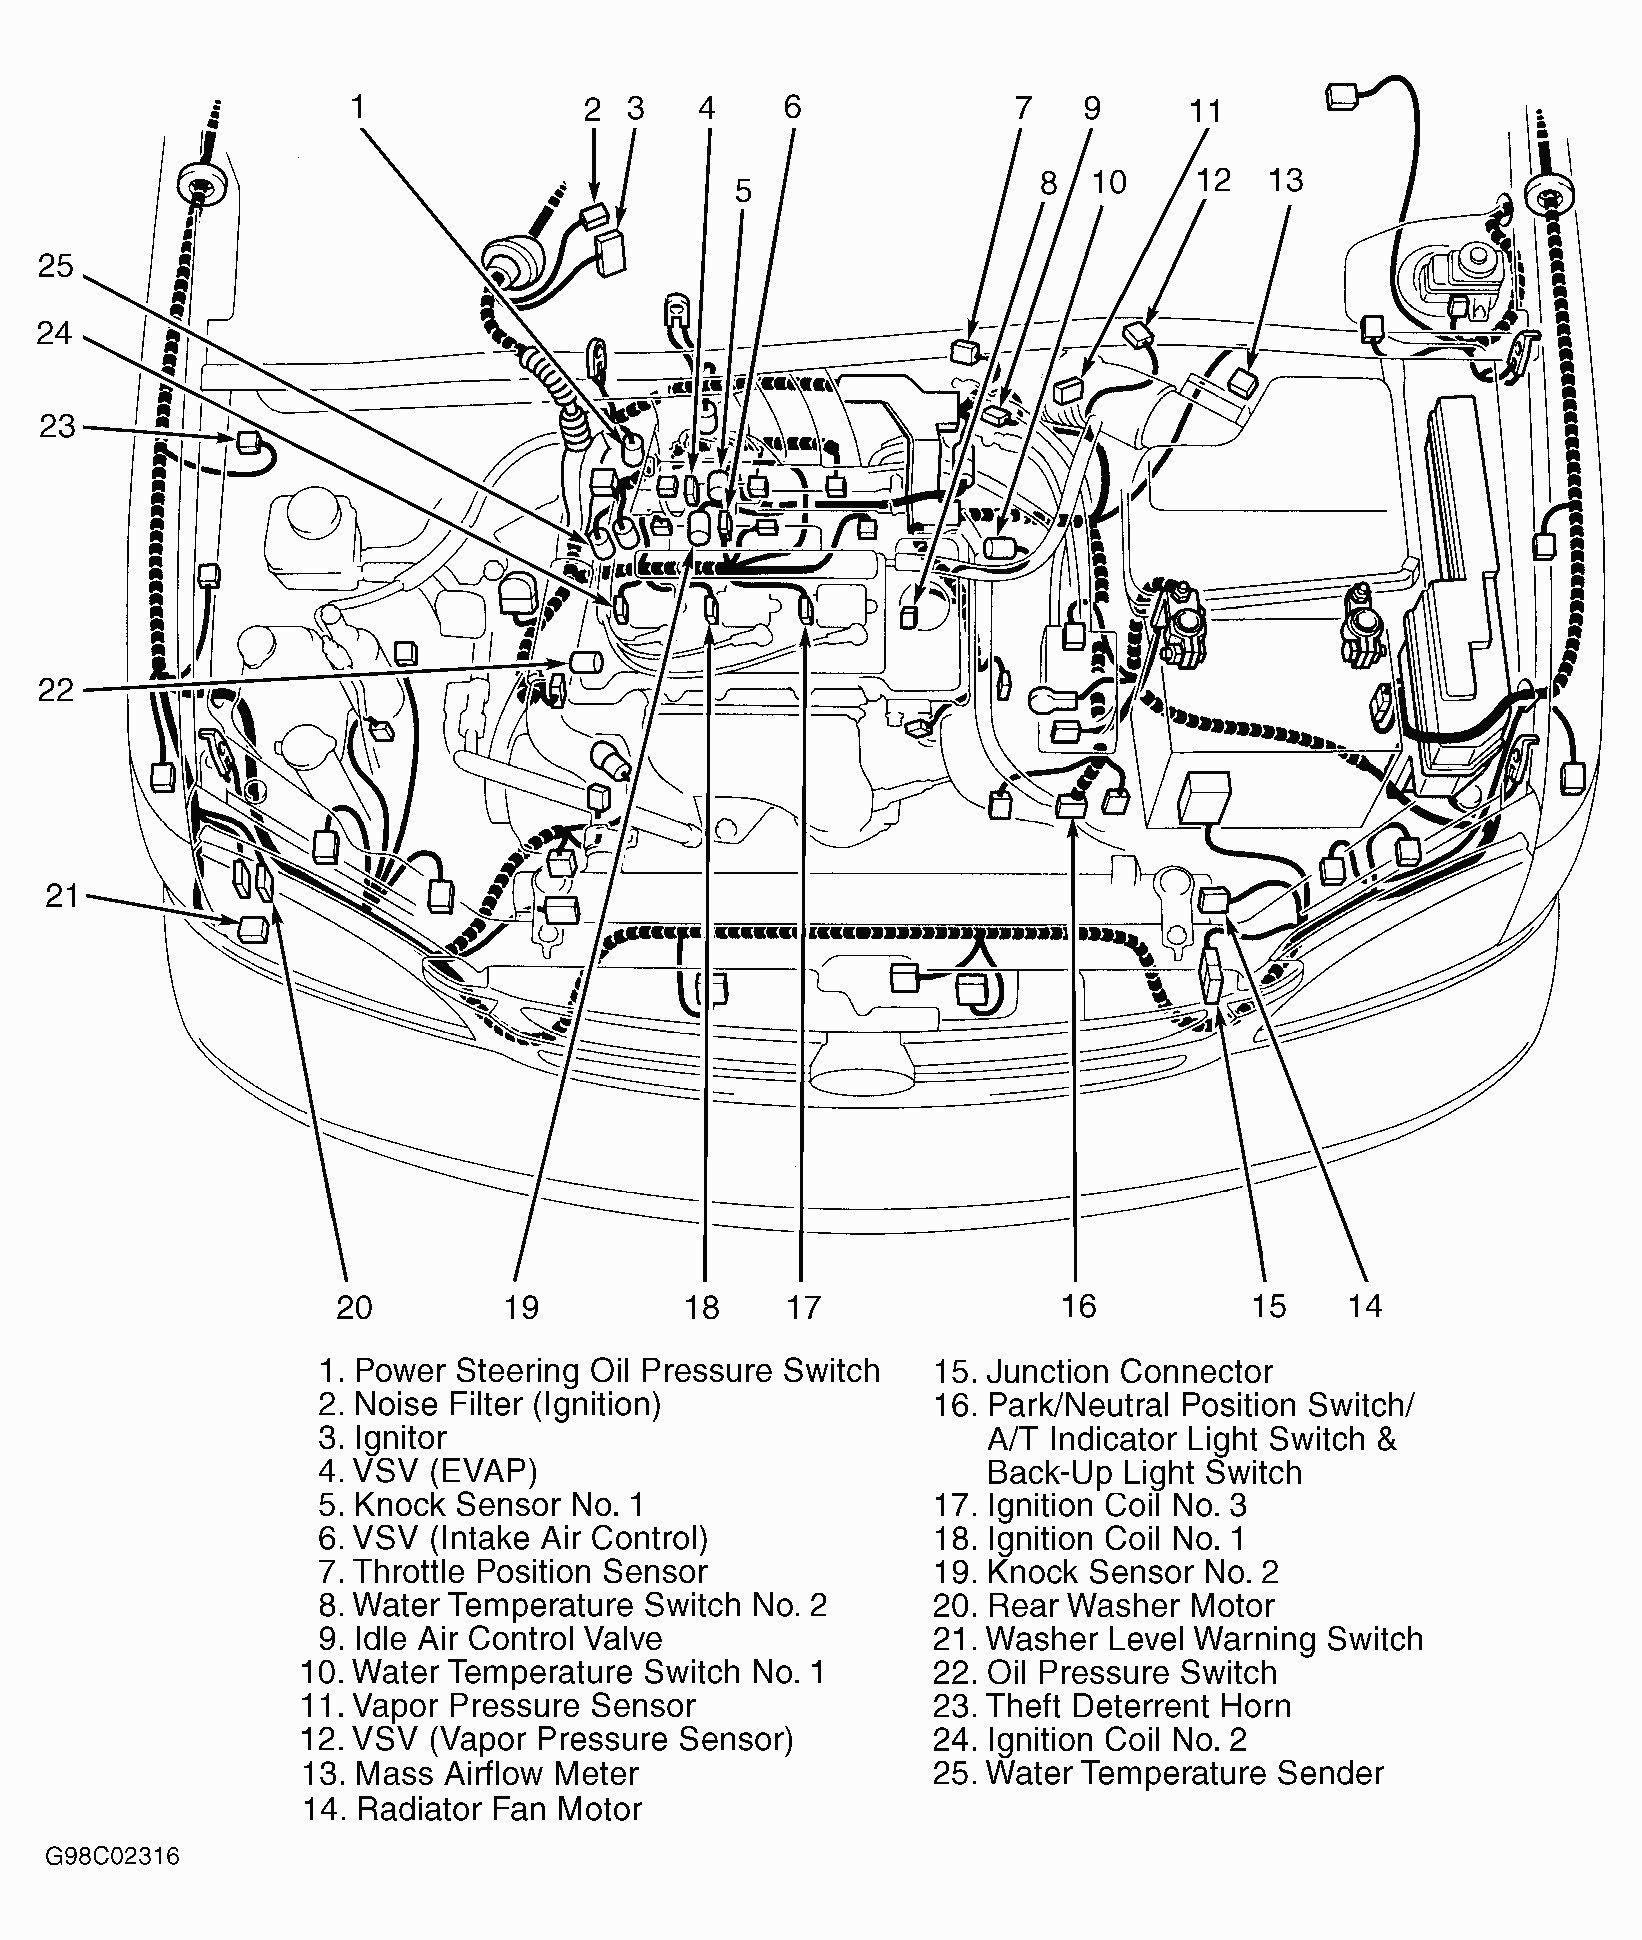 2002 Toyota Tacoma Engine Diagram In 2020 Toyota Corolla Toyota Tundra Toyota